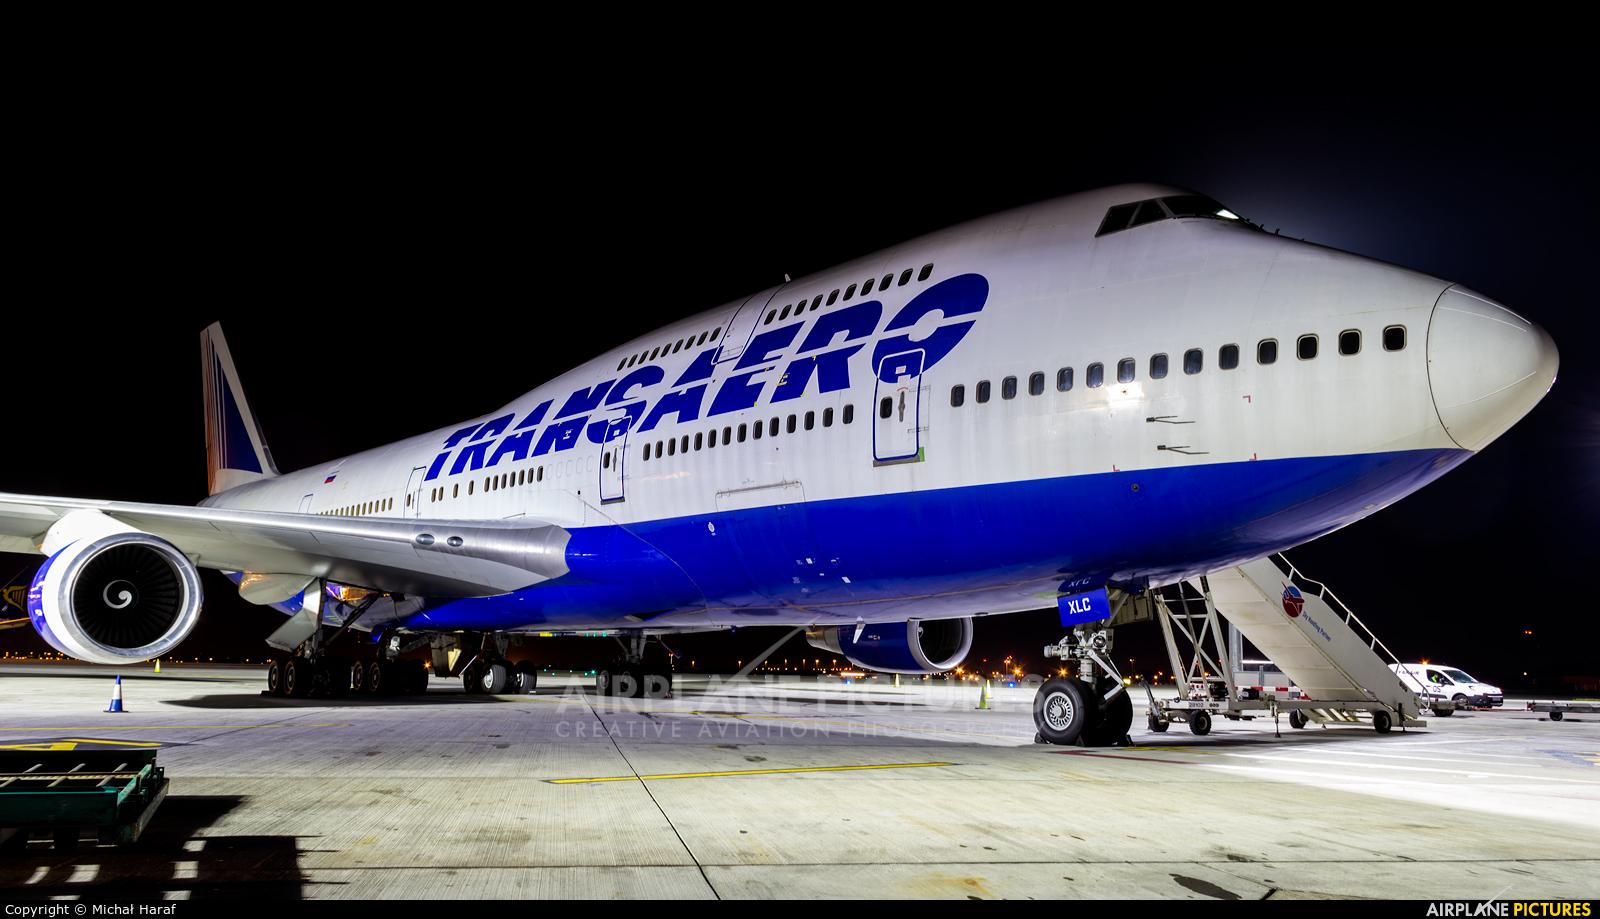 Transaero Airlines EI-XLC aircraft at Dublin